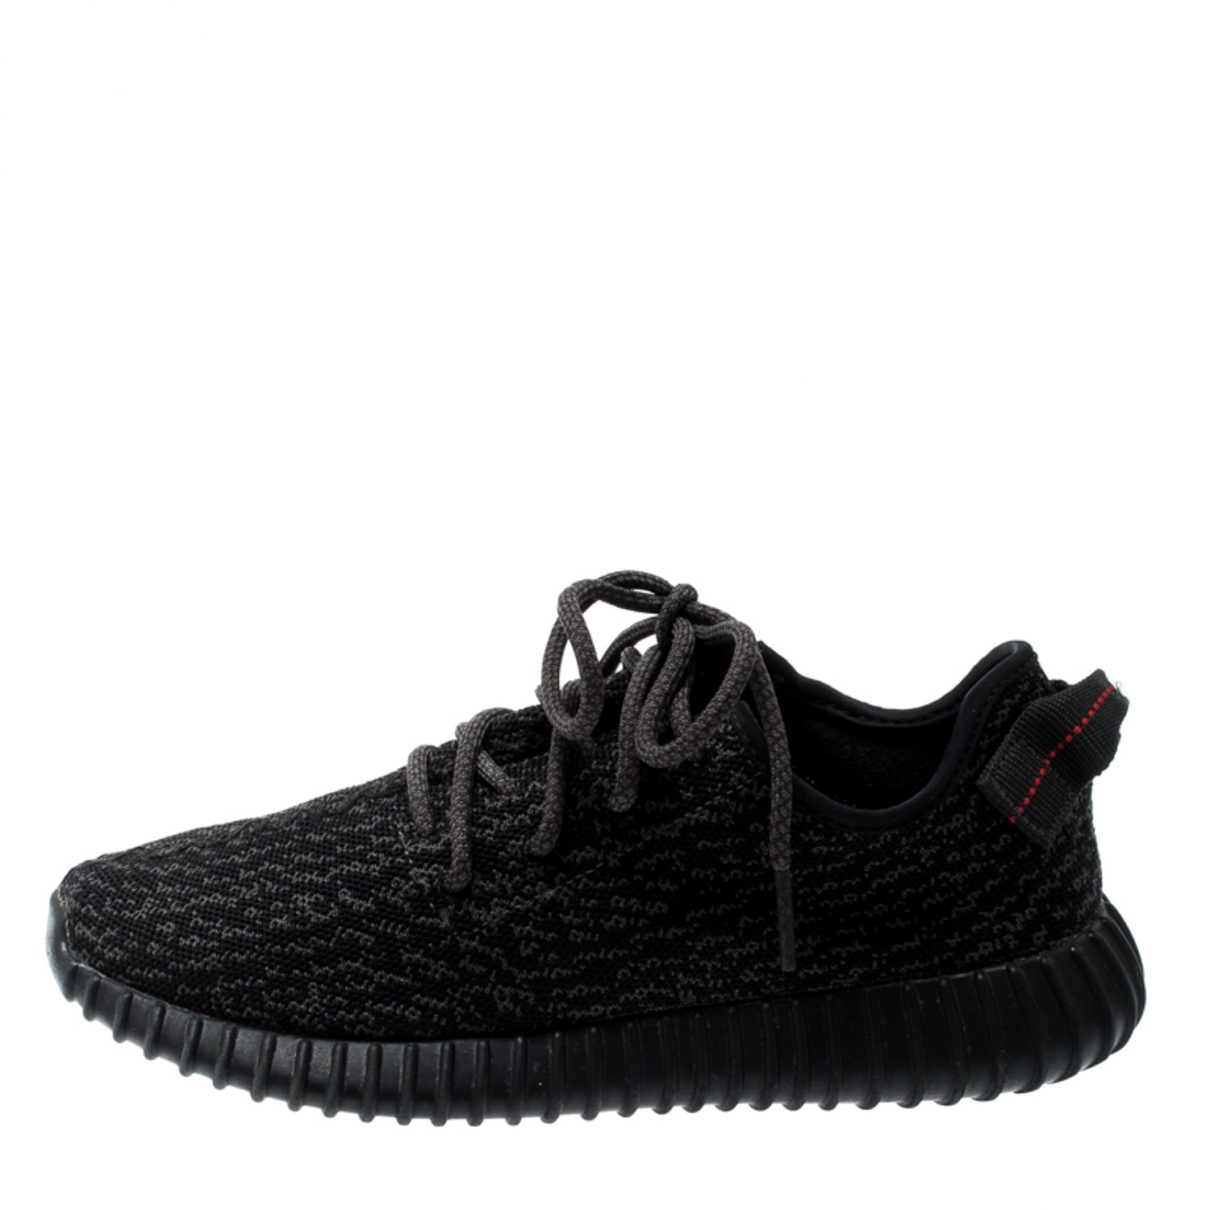 Yeezy X Adidas Boost 350 V1 Sneakers in  Schwarz Leinen